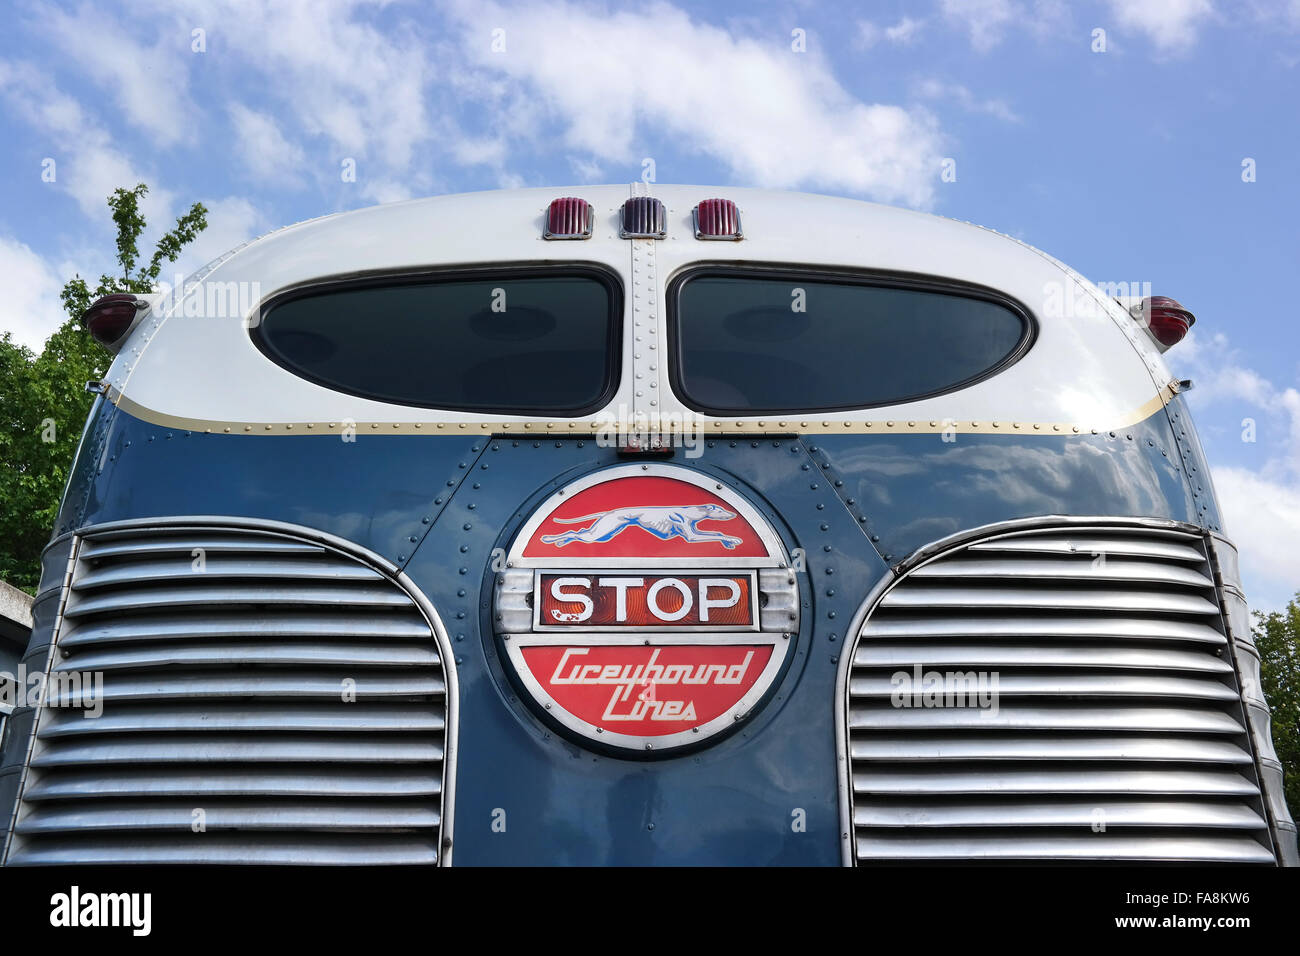 Rückseite des Oldtimer Bus der Greyhound Lines. Stockbild